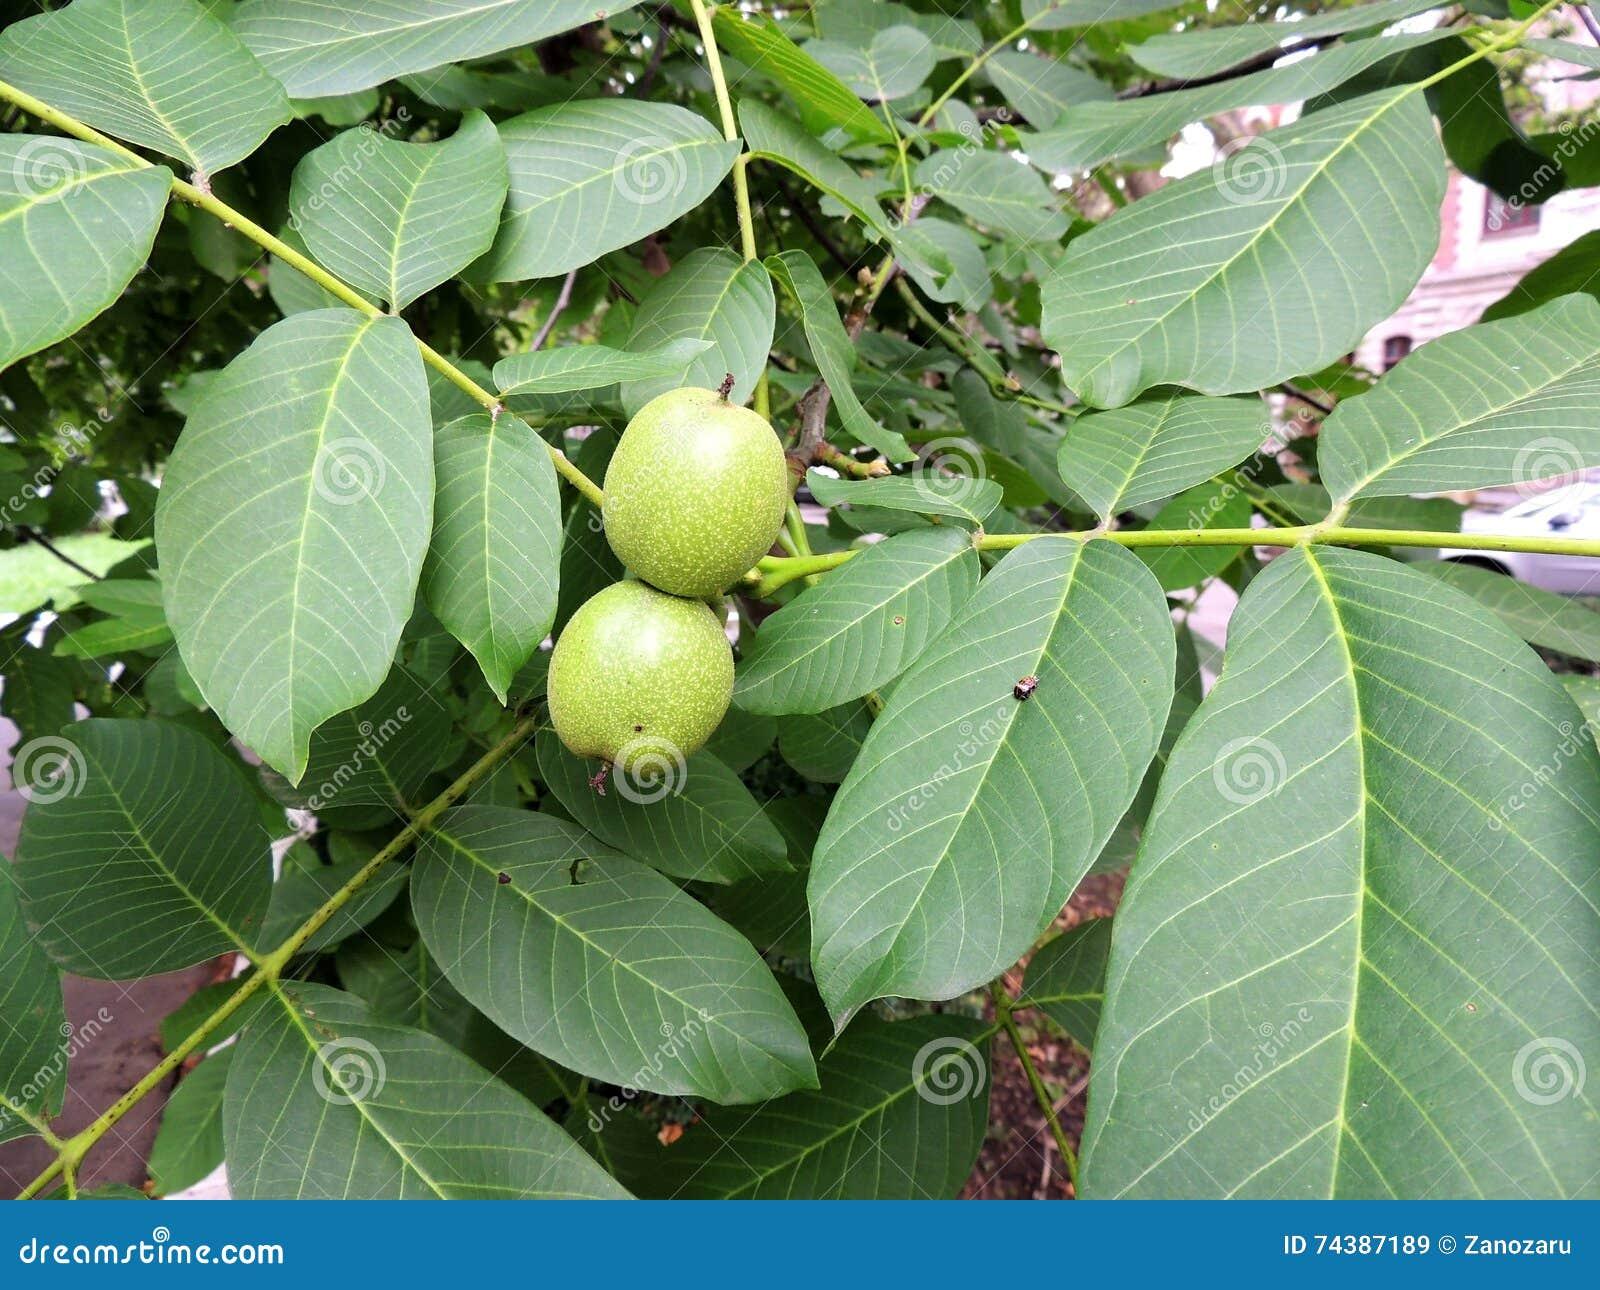 immature fruits of walnut juglans regia stock image image 74387189. Black Bedroom Furniture Sets. Home Design Ideas